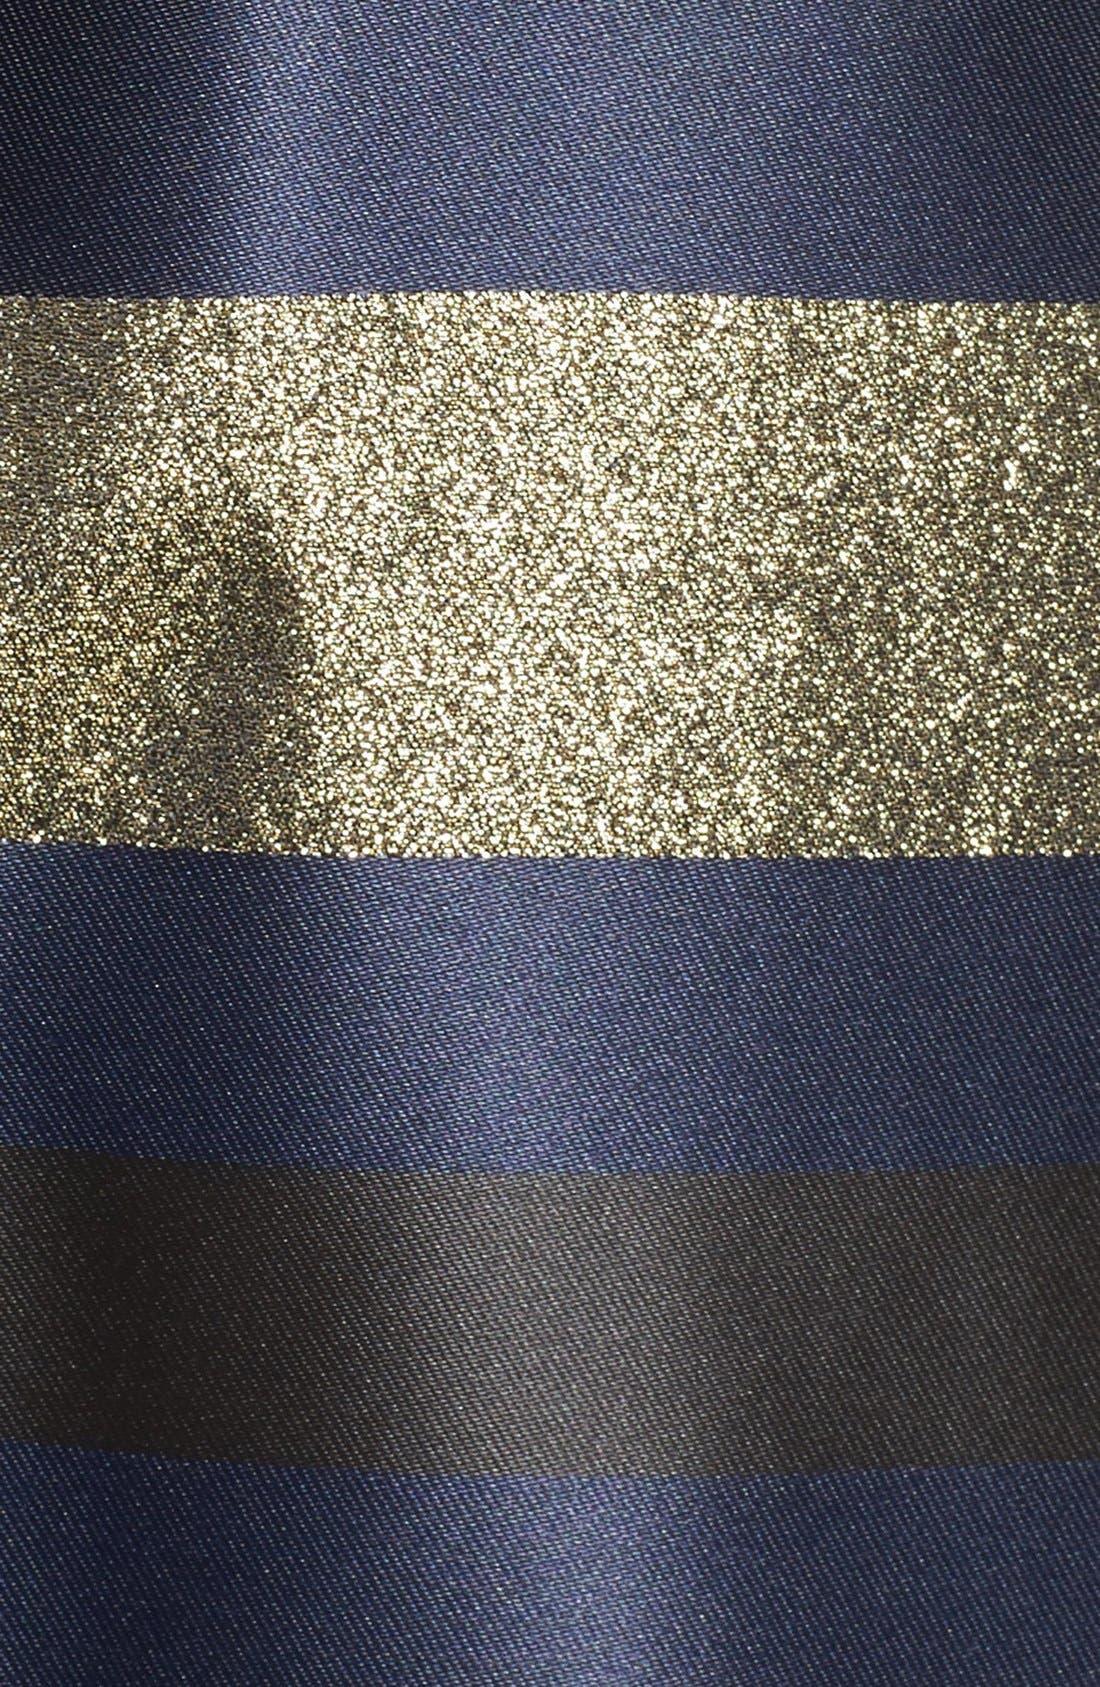 Alternate Image 5  - Xscape Metallic Ballgown (Regular & Petite)